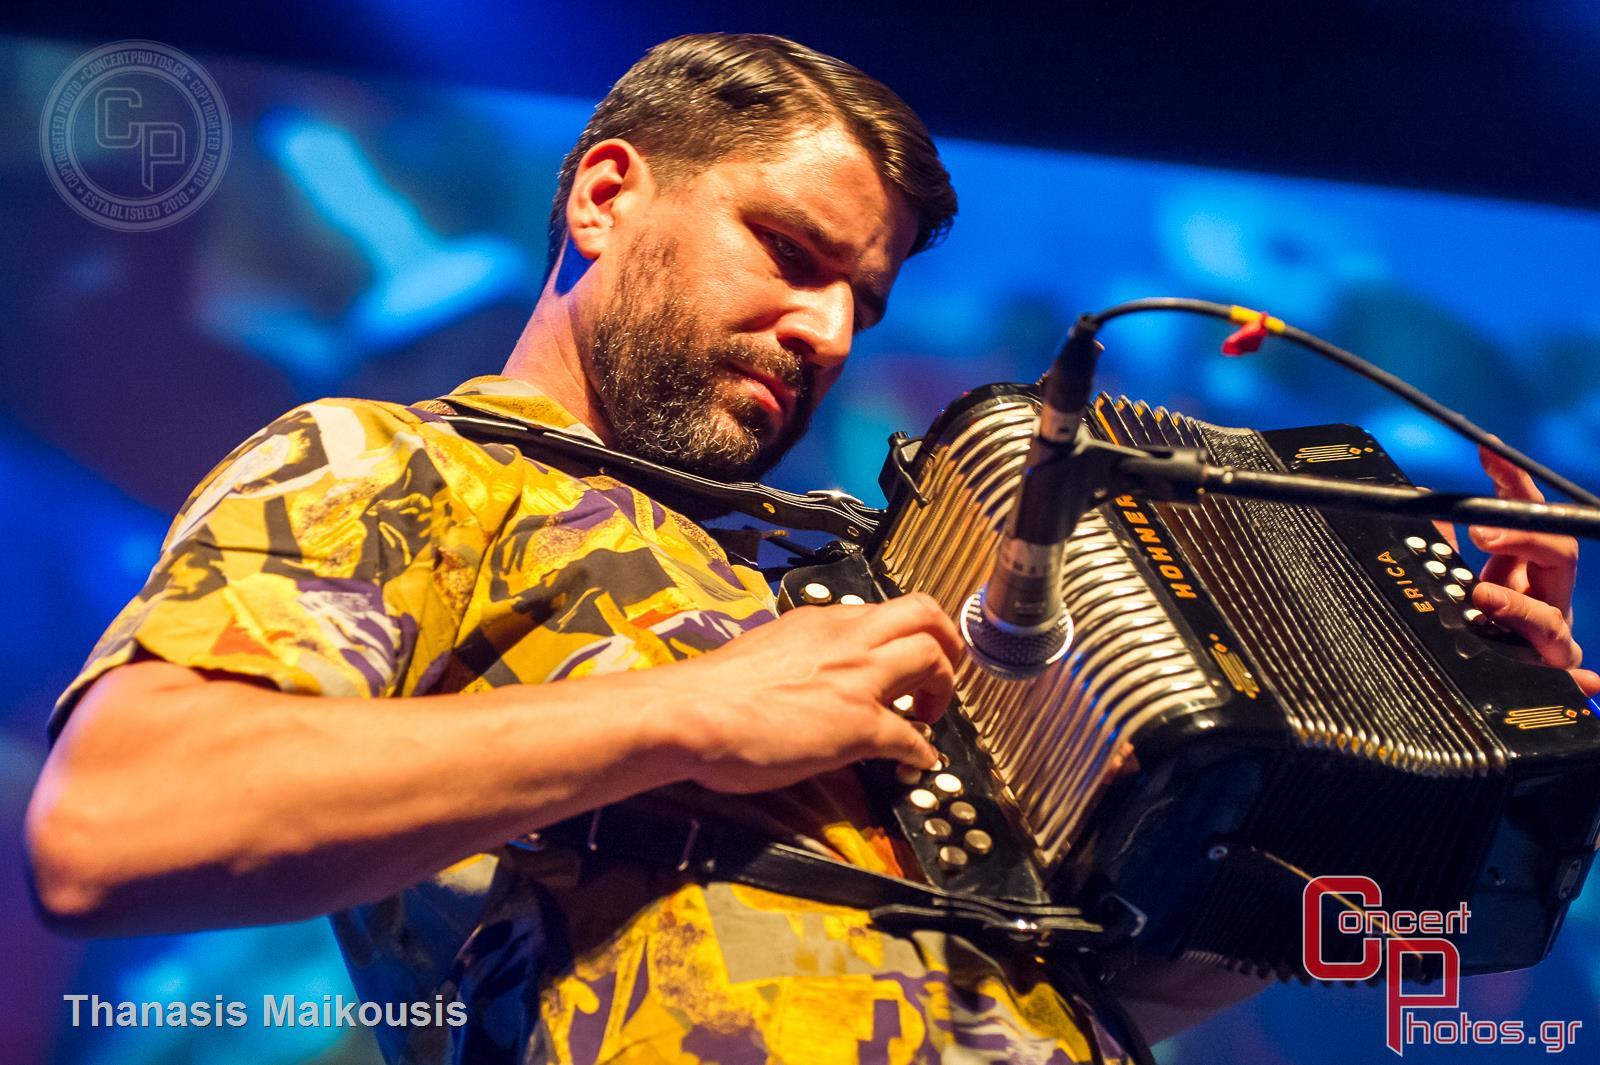 Quantic & Kill Emil -Quantic Kill Emil Gagarin photographer: Thanasis Maikousis - ConcertPhotos - 20141023_2305_18